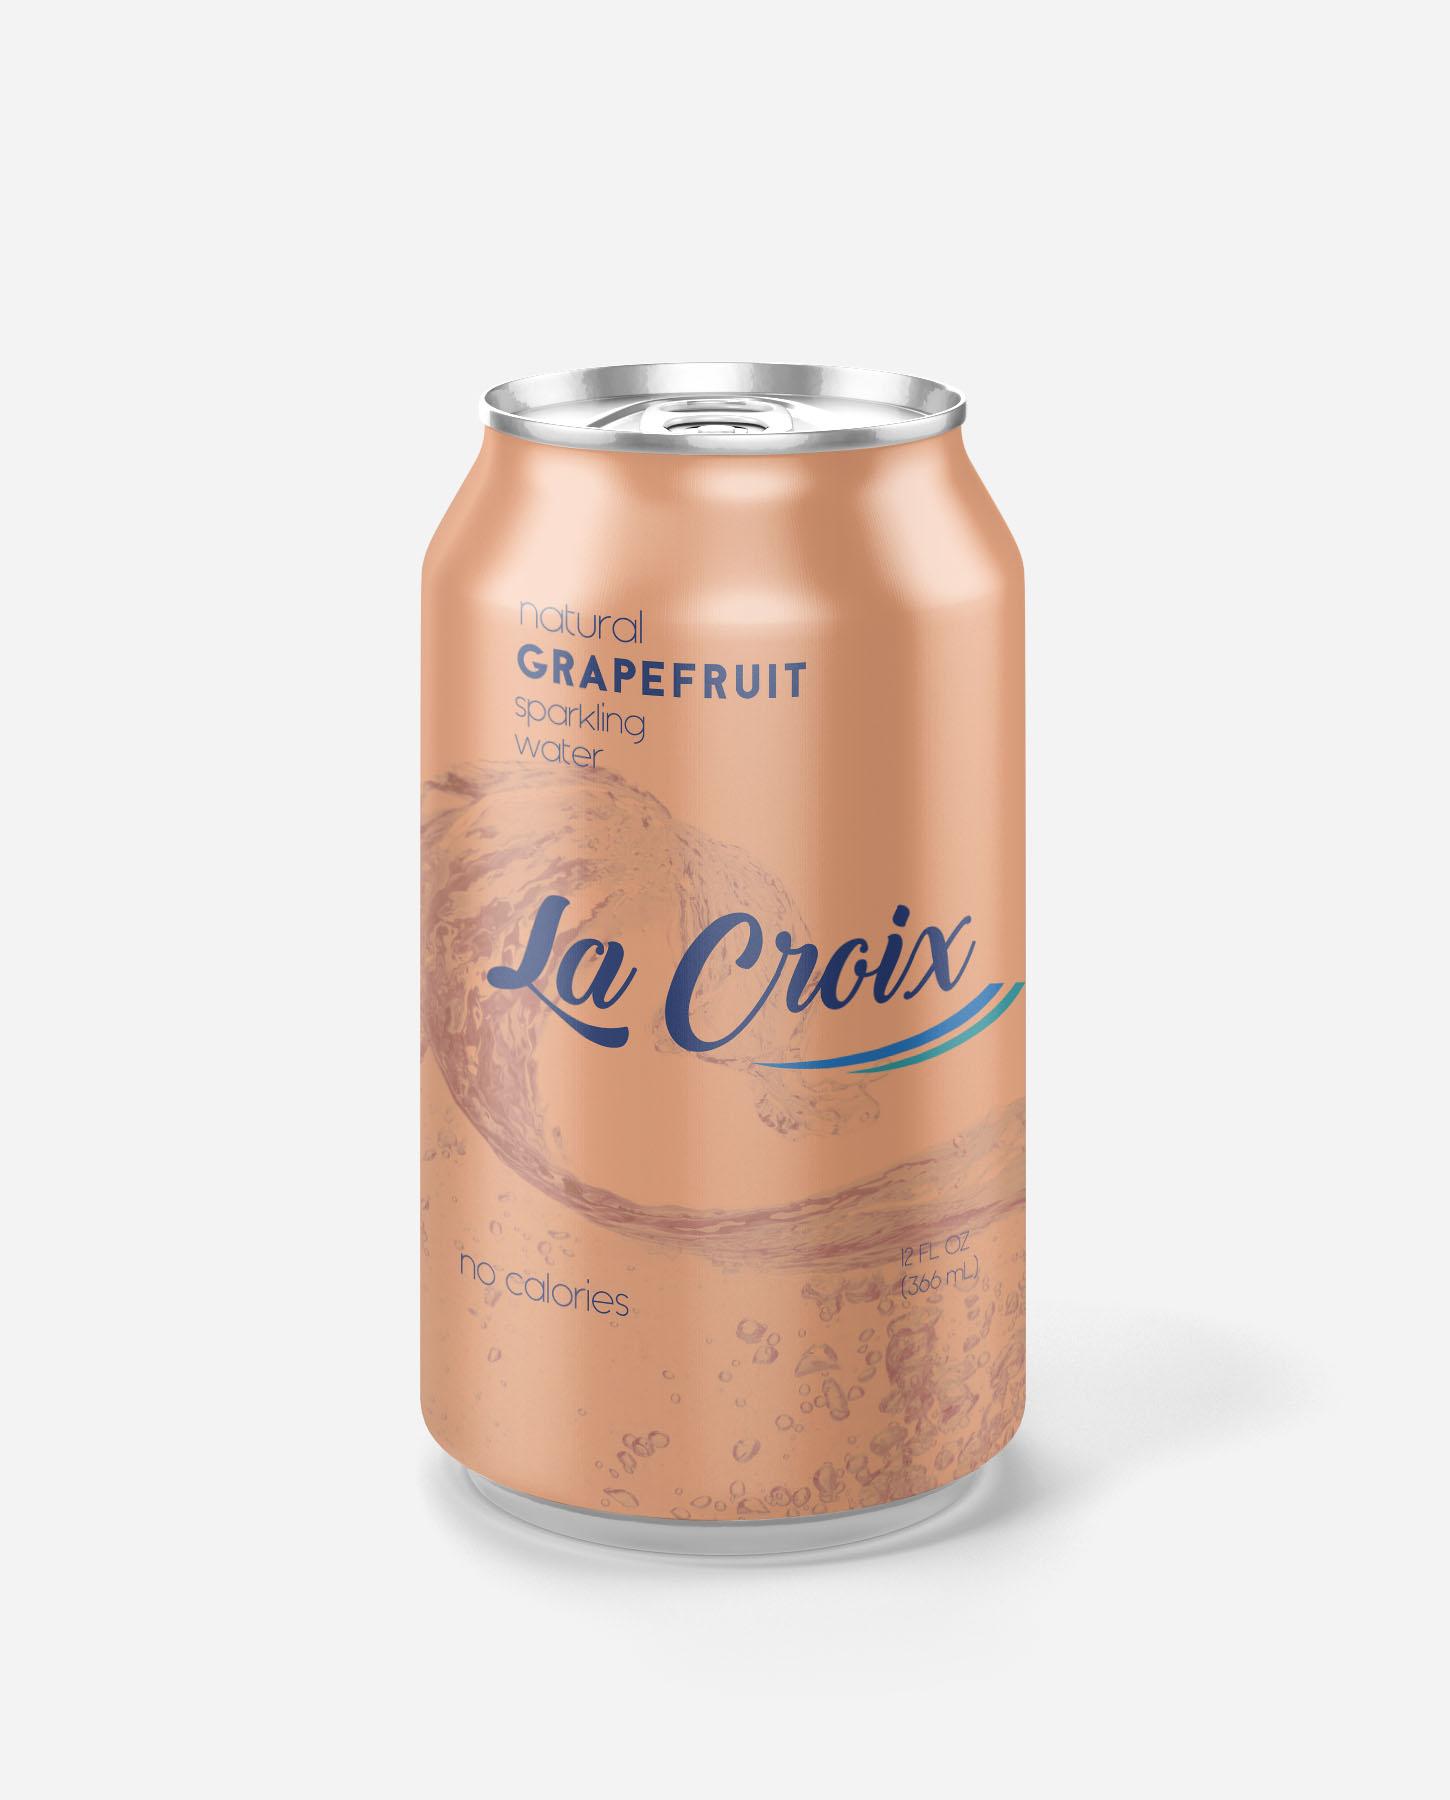 lacroix_grapefruit.jpg